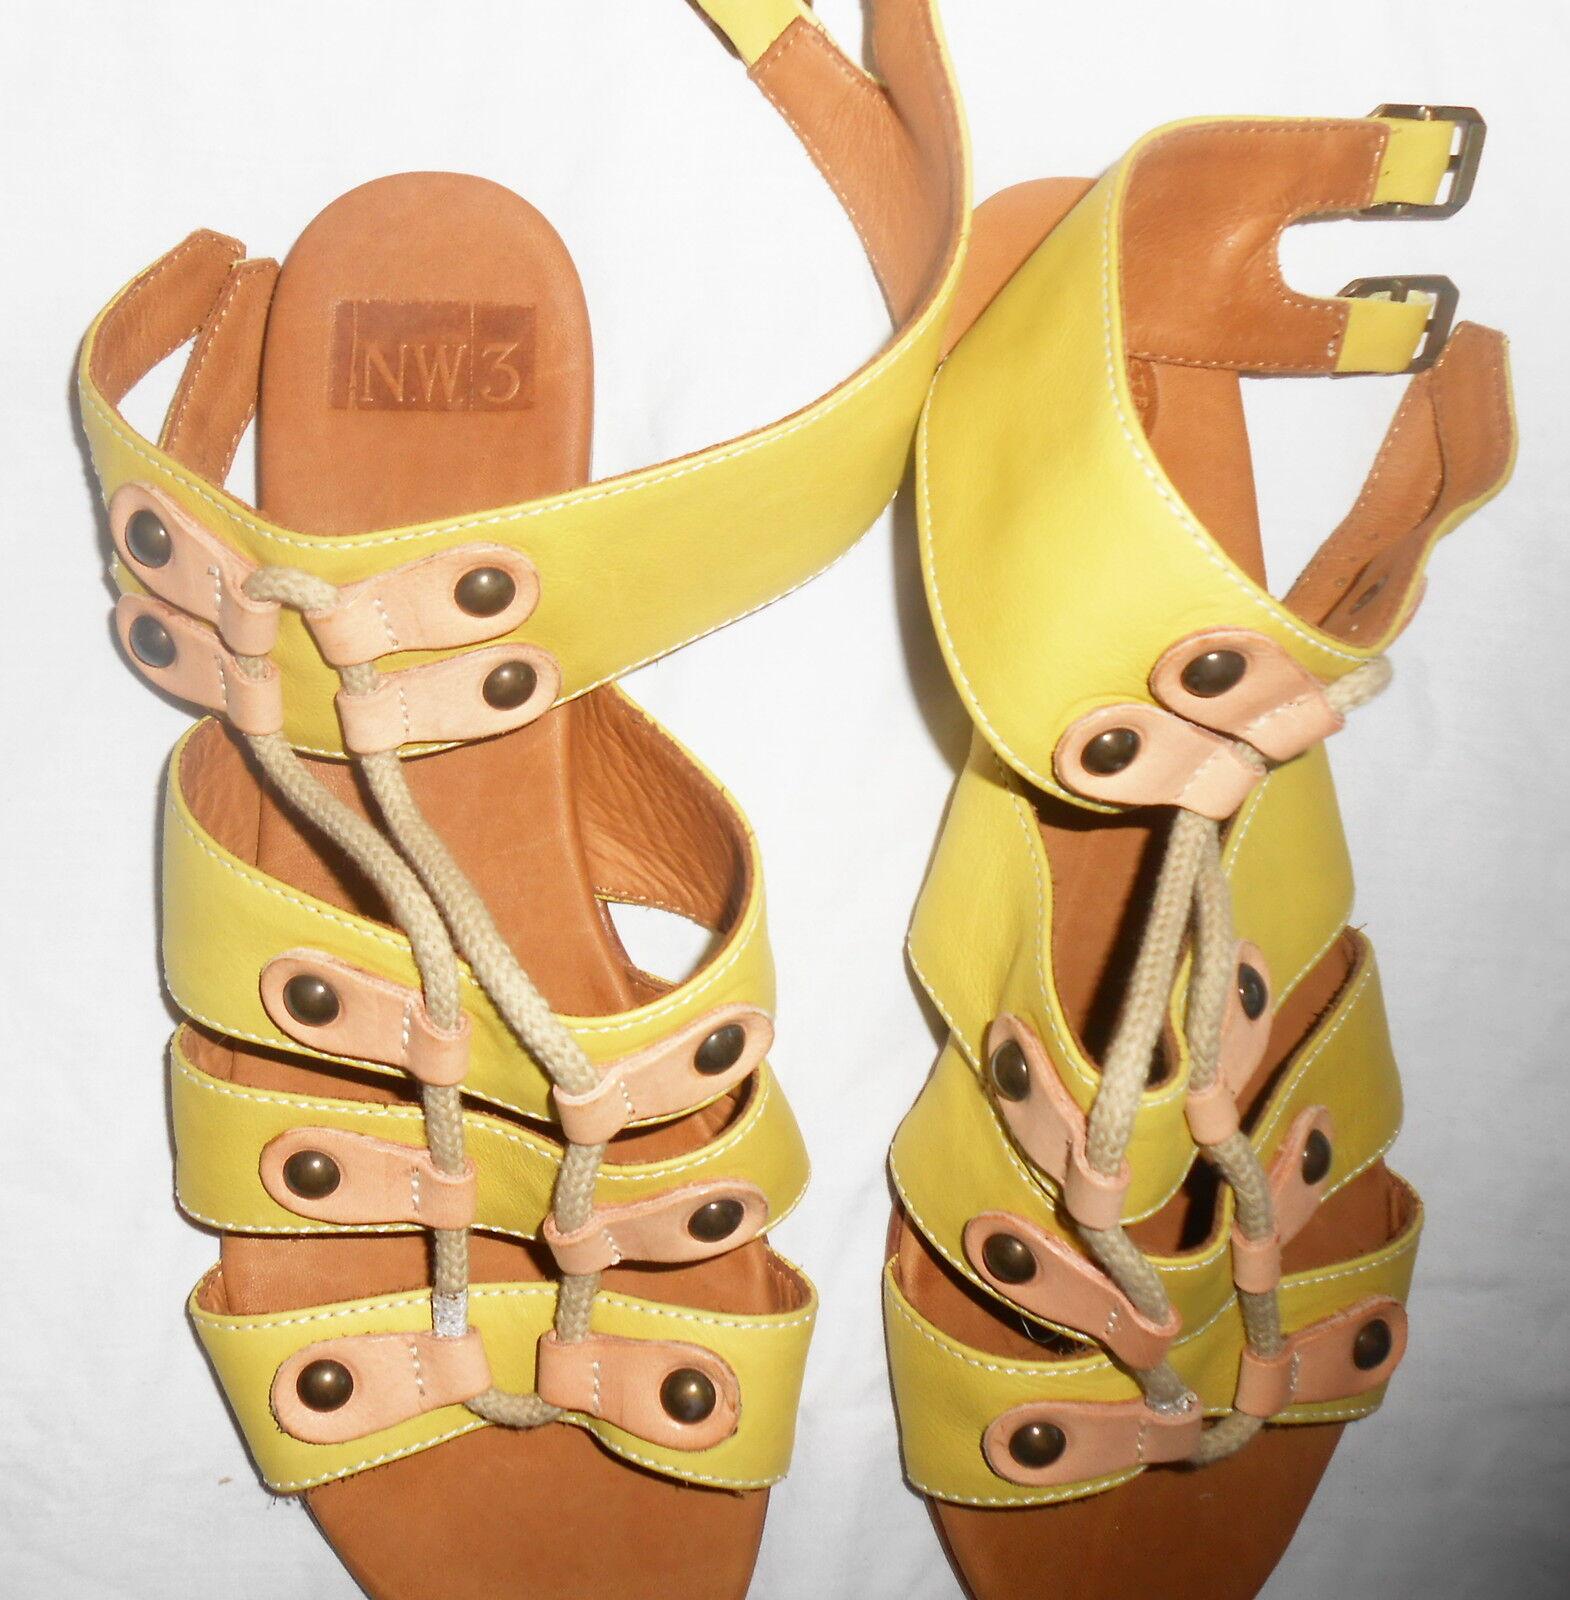 NW3 Hobbs Hampstead Rope Sandal green flat shoes Size box 39 6 brand new box Size BNIB 248377